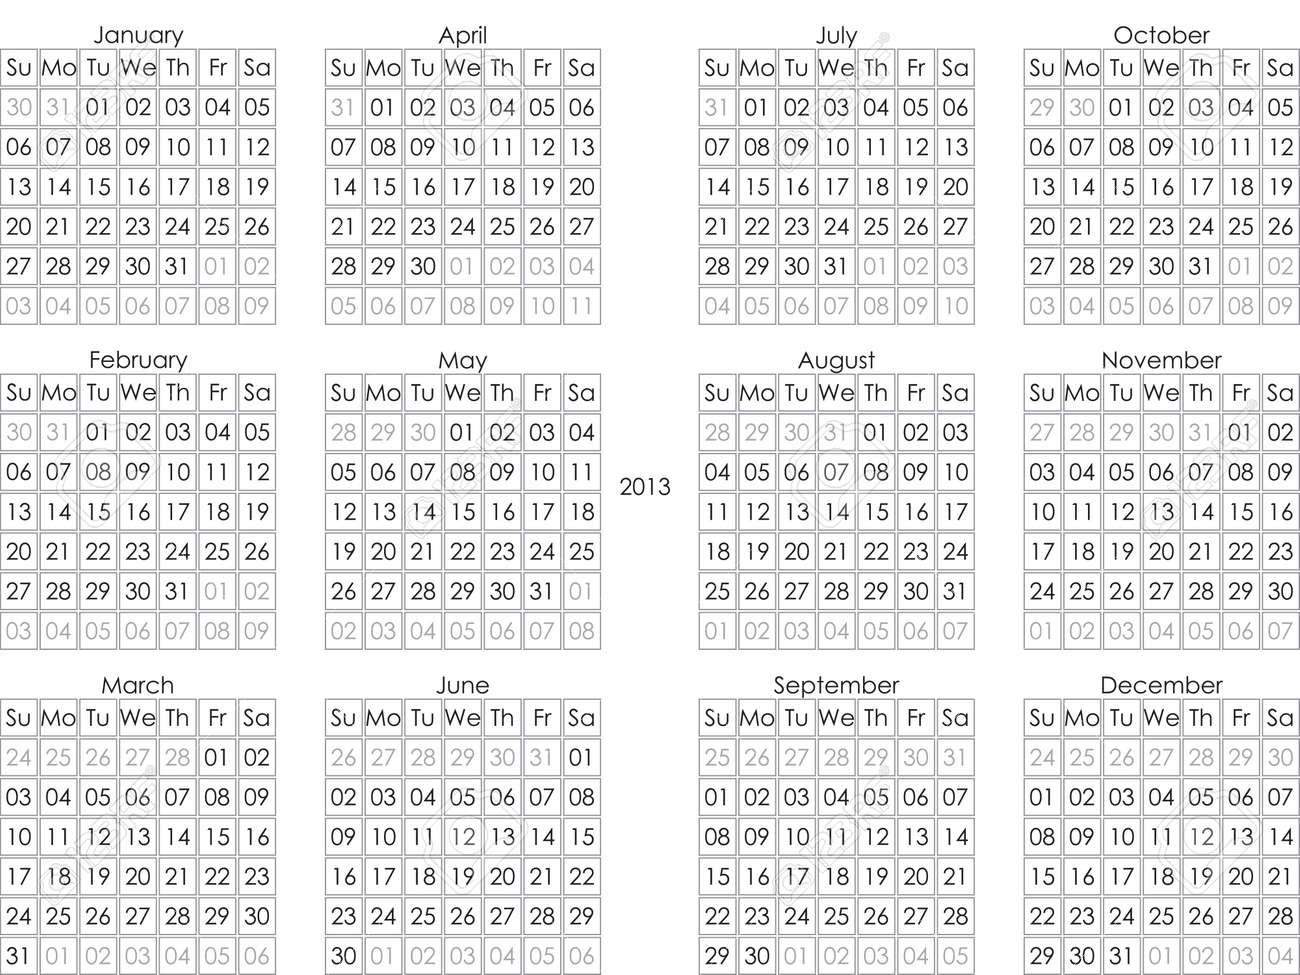 2013 Calendar Black Letters onTransparency Landskape Oriented Stock Vector - 17005898